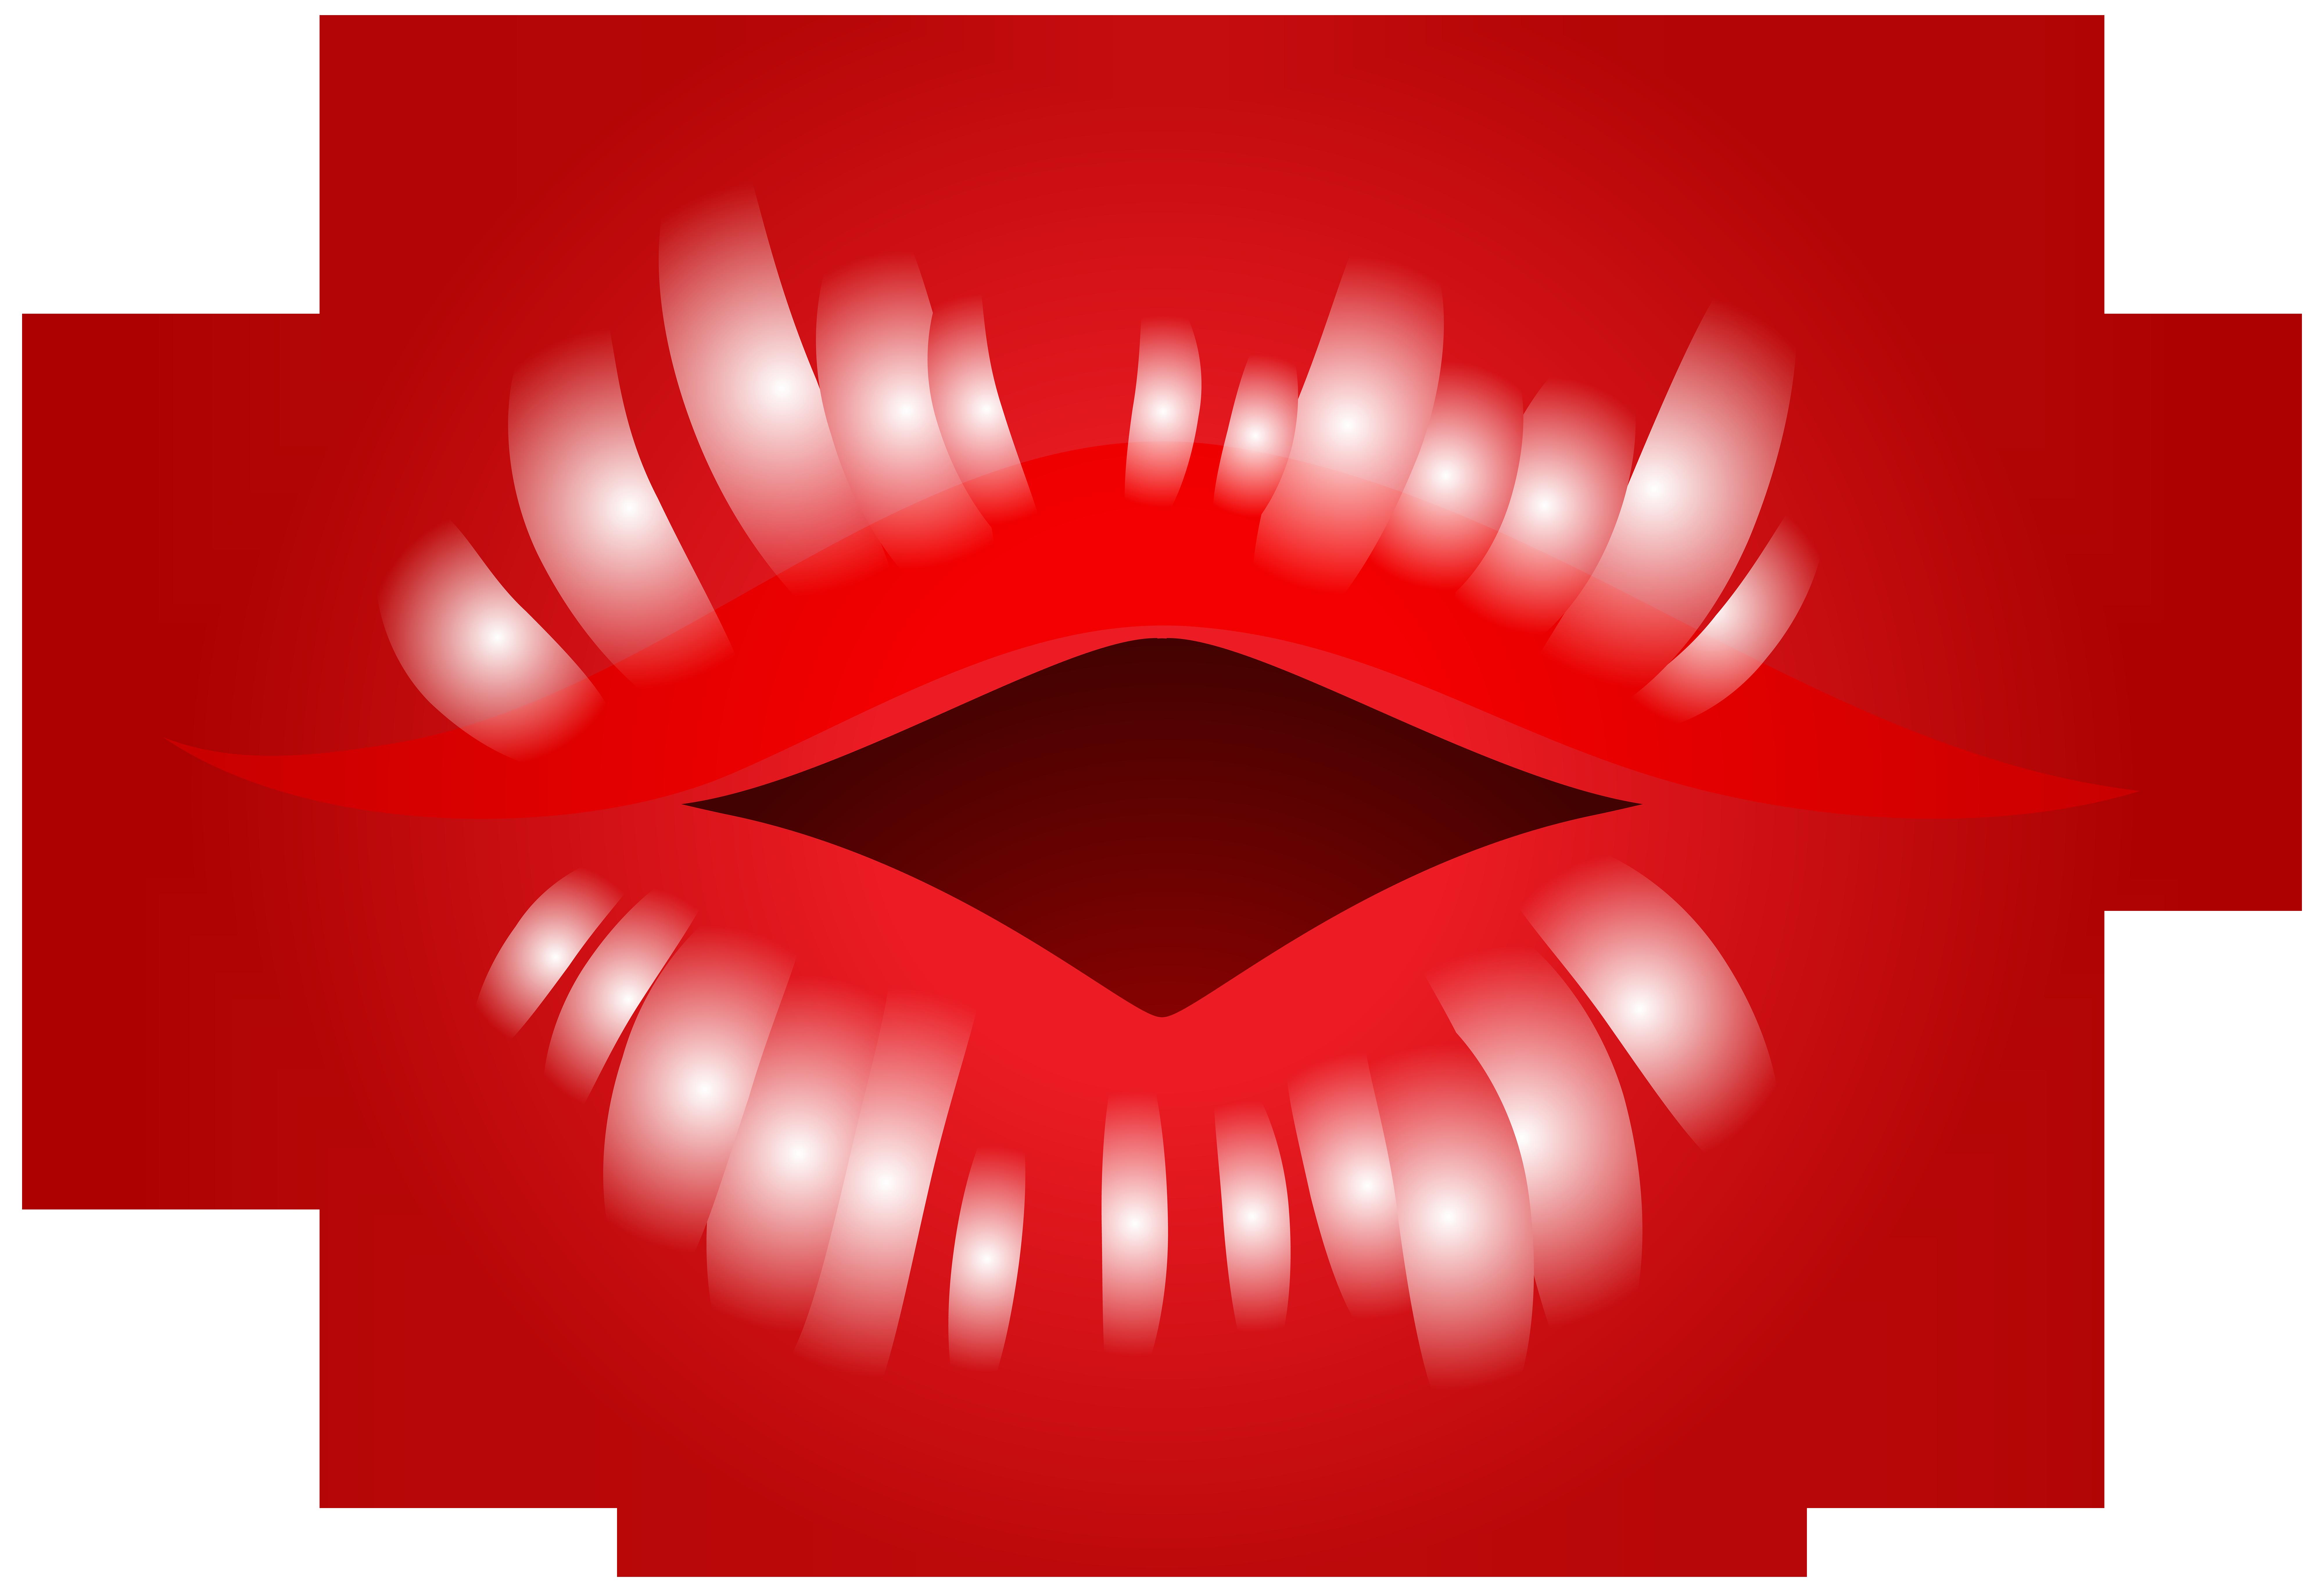 8000x5481 Kiss Lips Png Clip Art Imageu200b Gallery Yopriceville